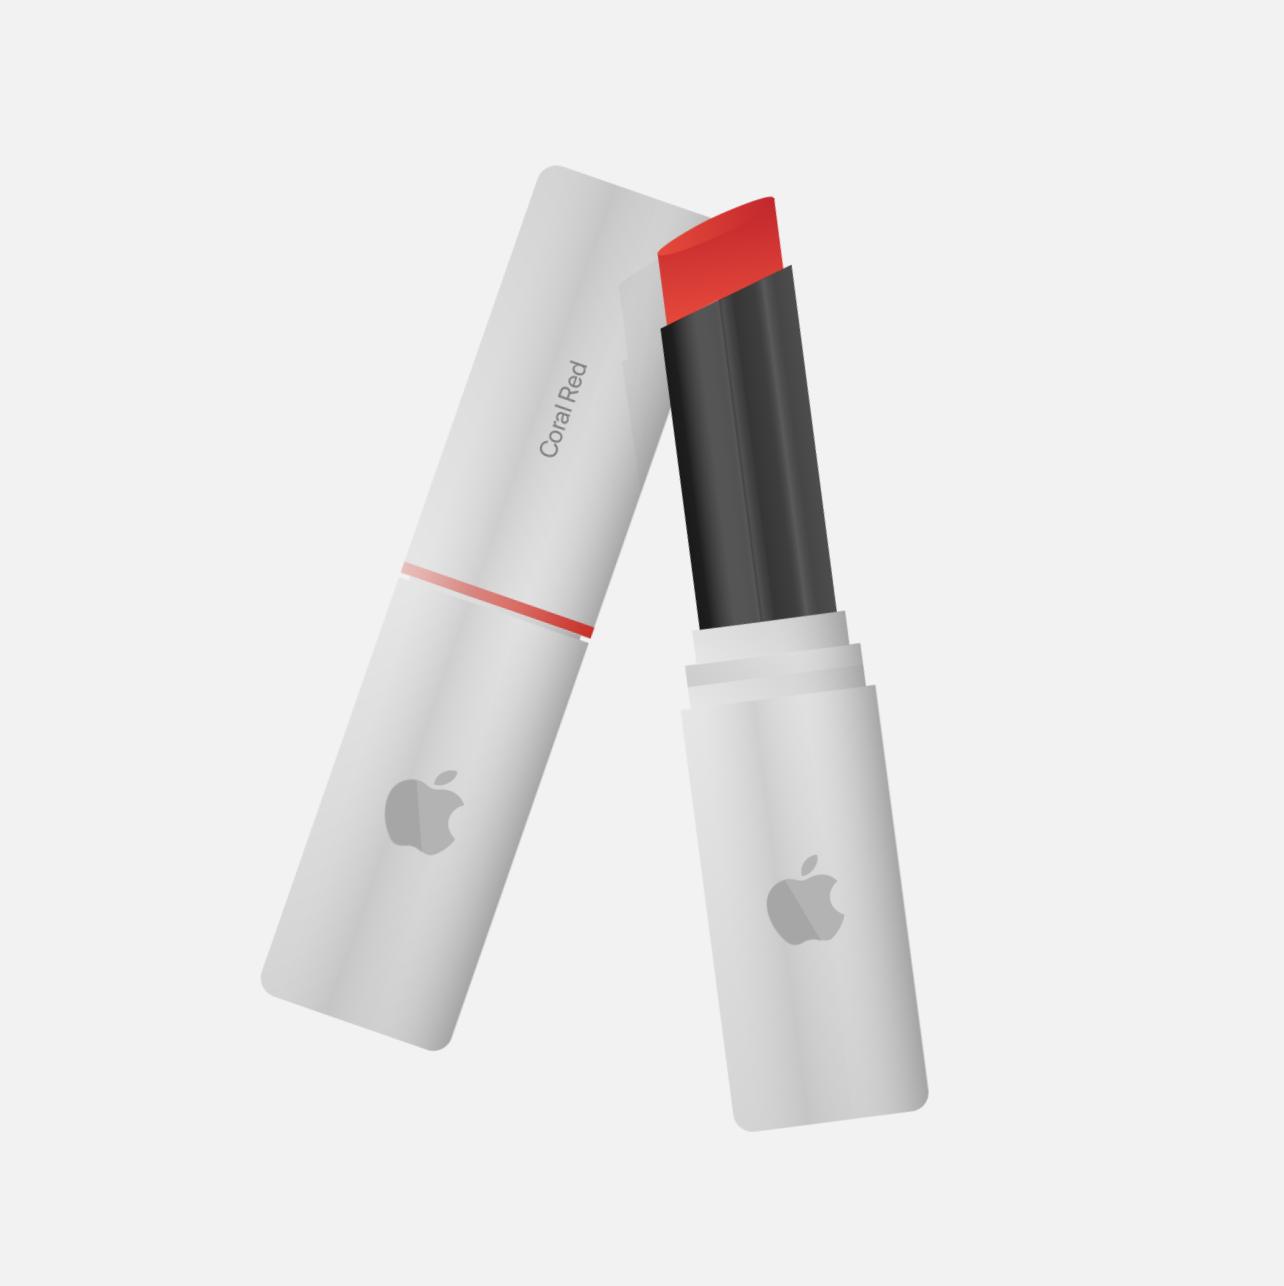 amy-jones-mackeeper-apple-concept-mac-lipstick@2x